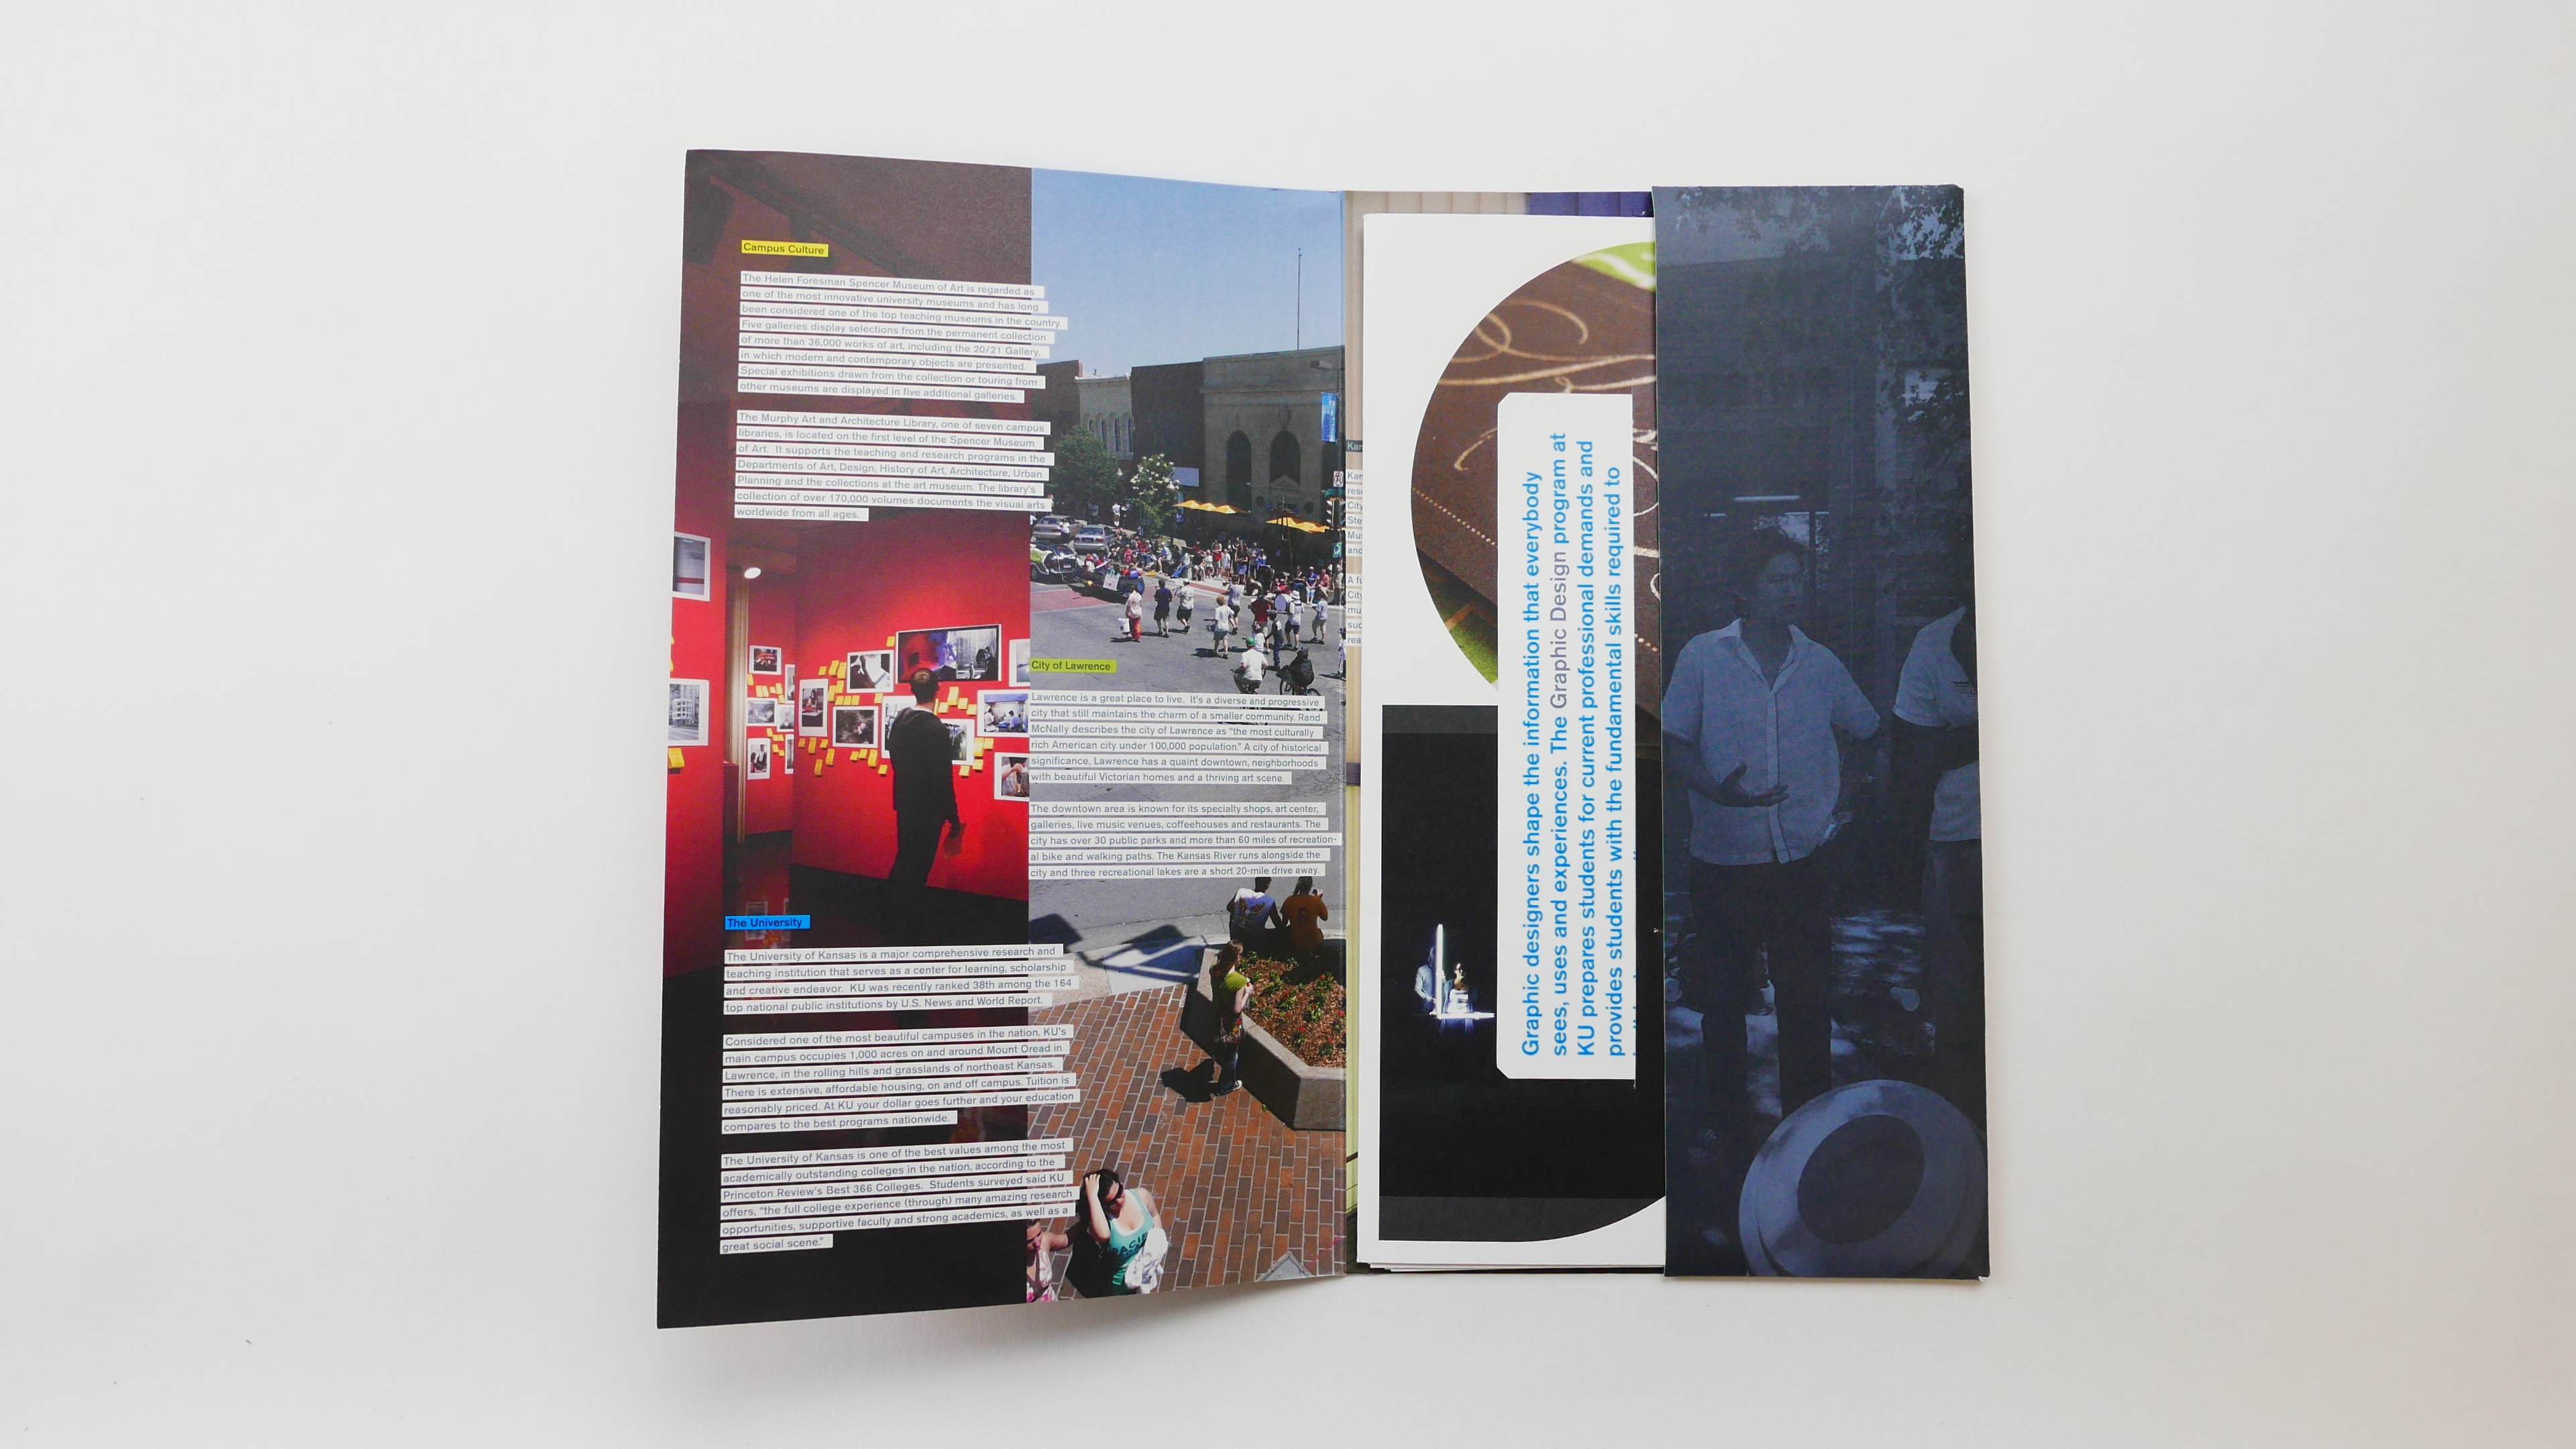 Design Department Promotional Materials - Jeremy Shellhorn